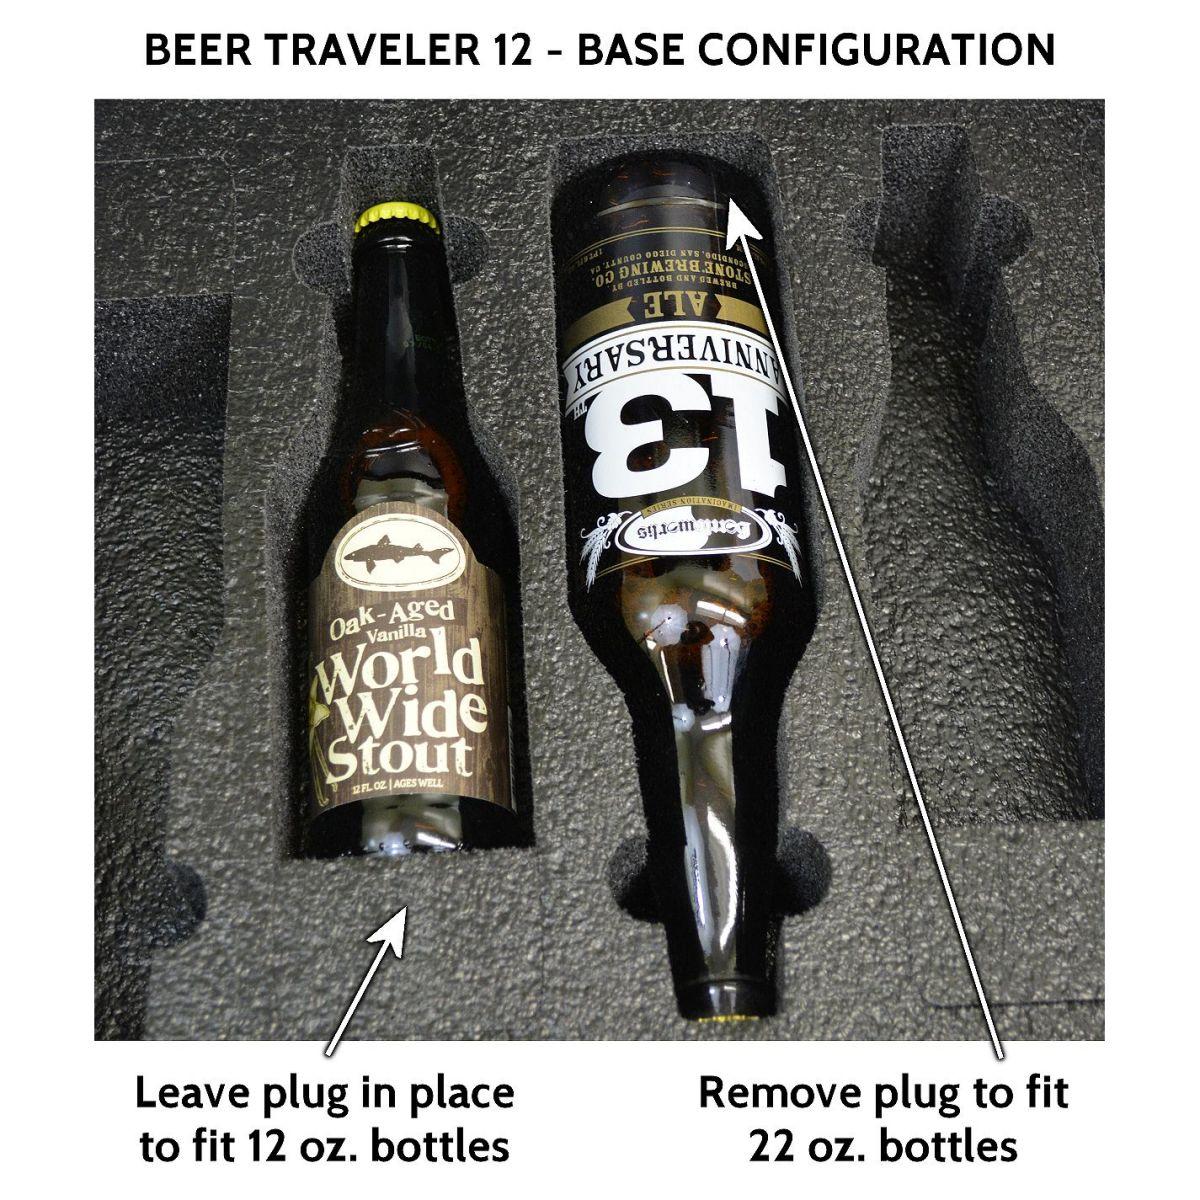 Seahorse SE-920 BC Beer Traveler 12 Custom Foam Case - Base Configuration